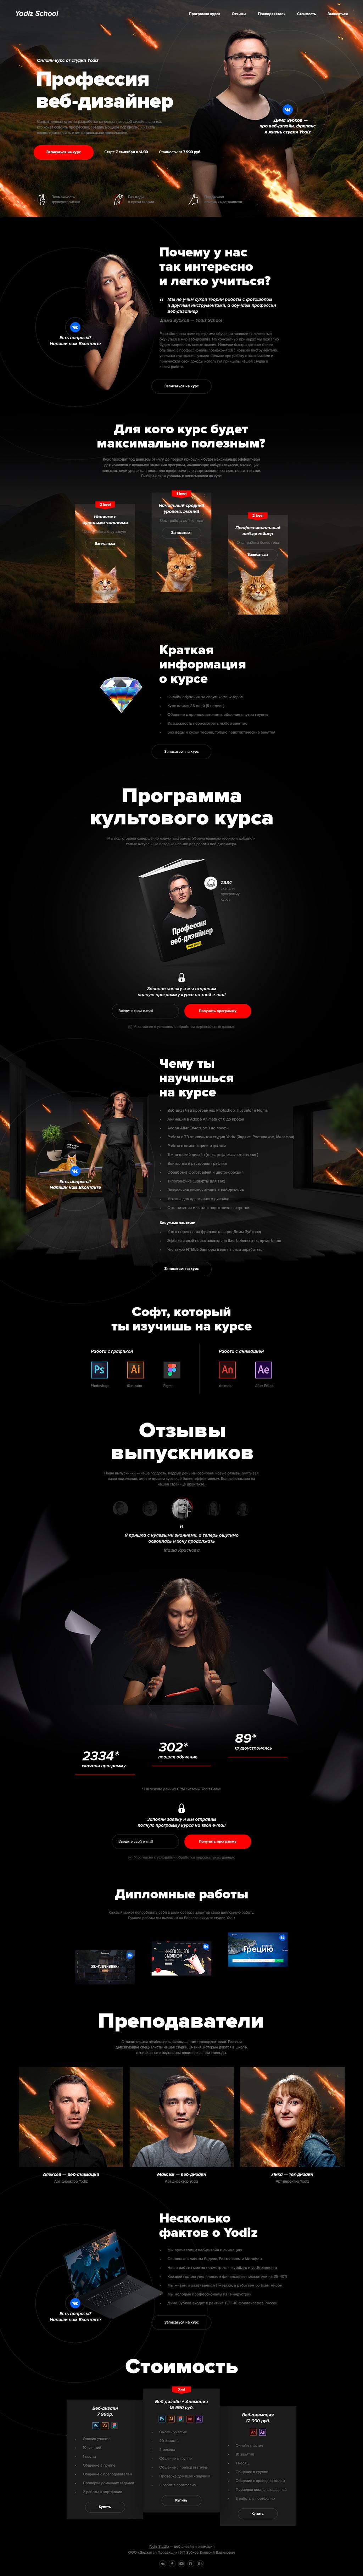 Landing Page для онлайн школы веб-дизайна Yodiz School